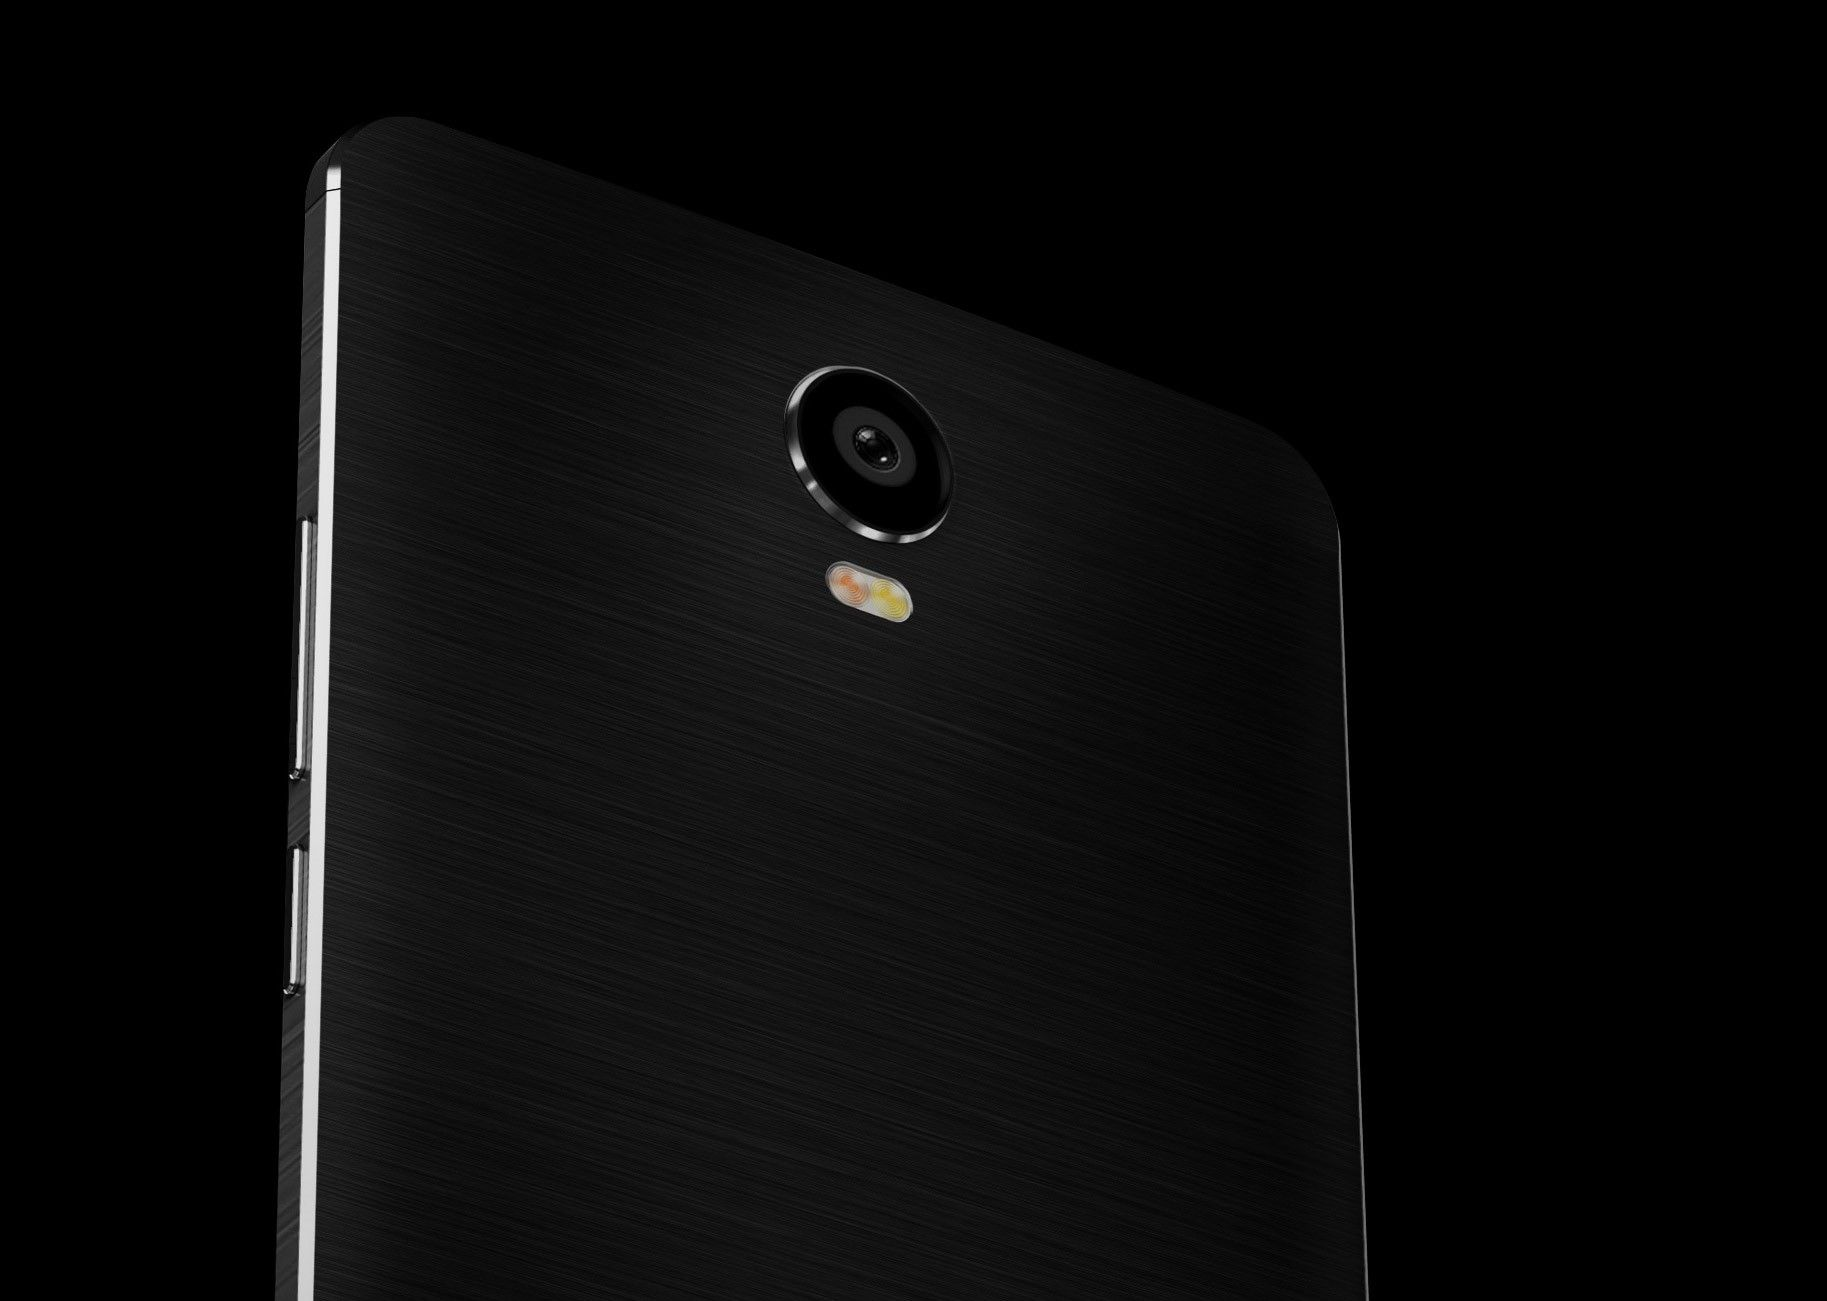 Bluboo Maya Premium To Feature Helio P10 Processor And Sony Imx298